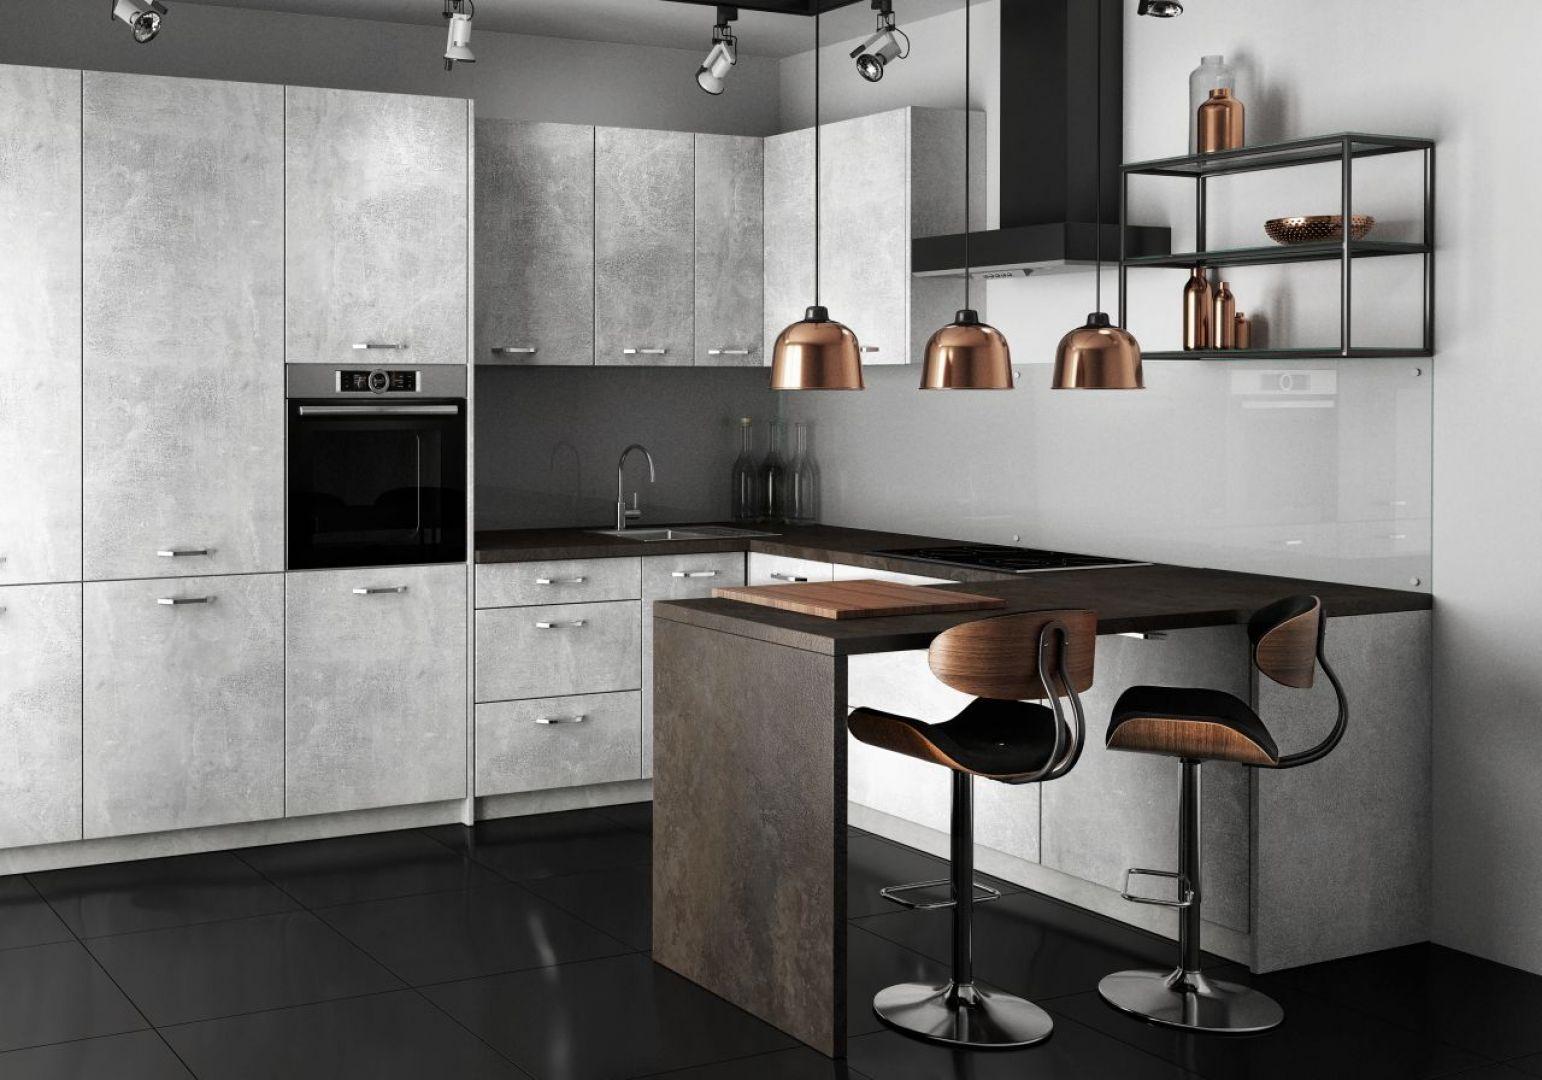 Kuchnia Atelier. Fot. Classen